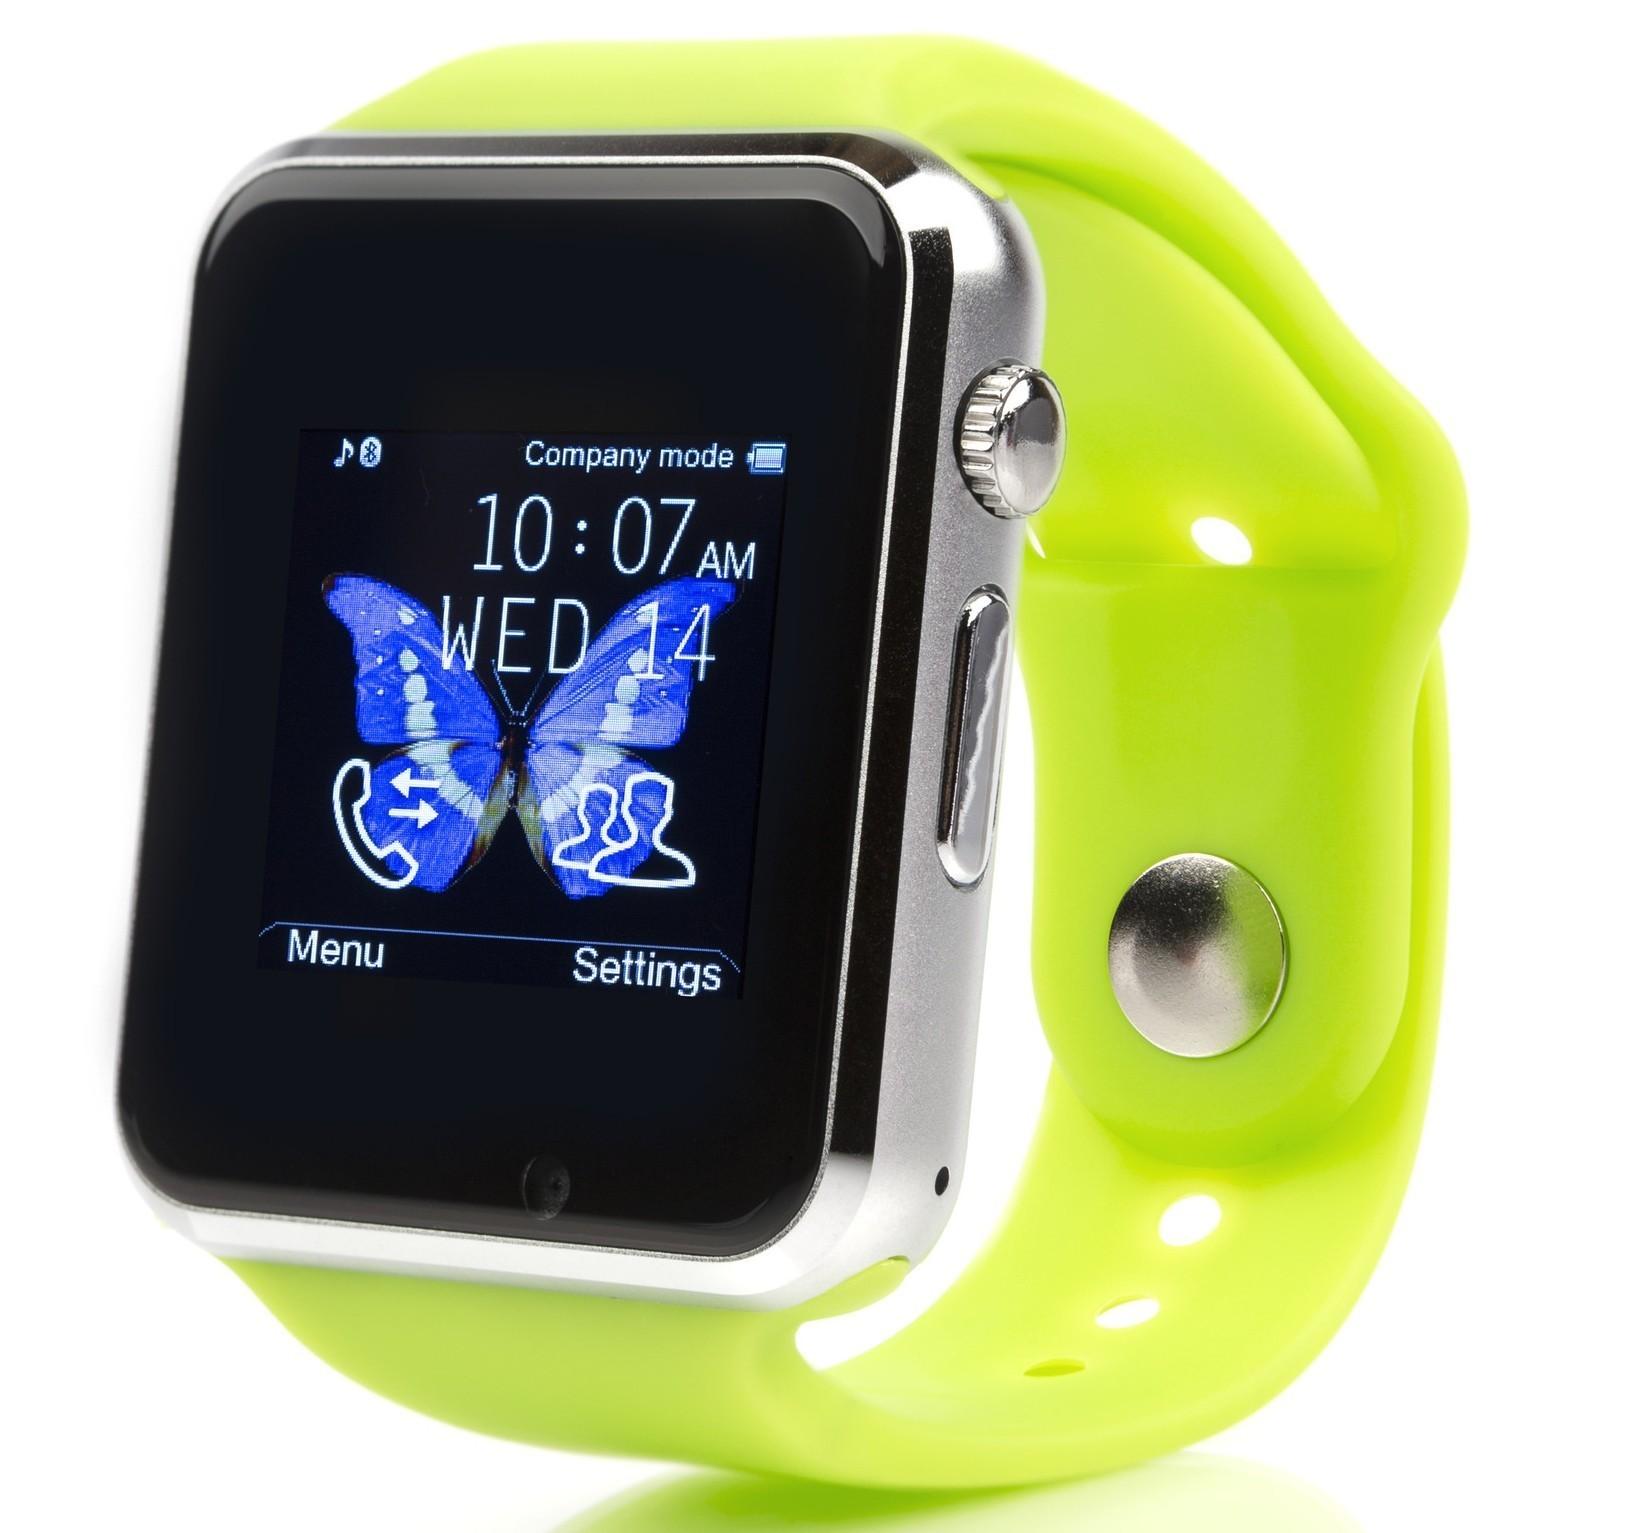 Smartwatch cu Telefon iUni A100i, LCD 1.54 Inch, BT, Camera, Verde imagine techstar.ro 2021